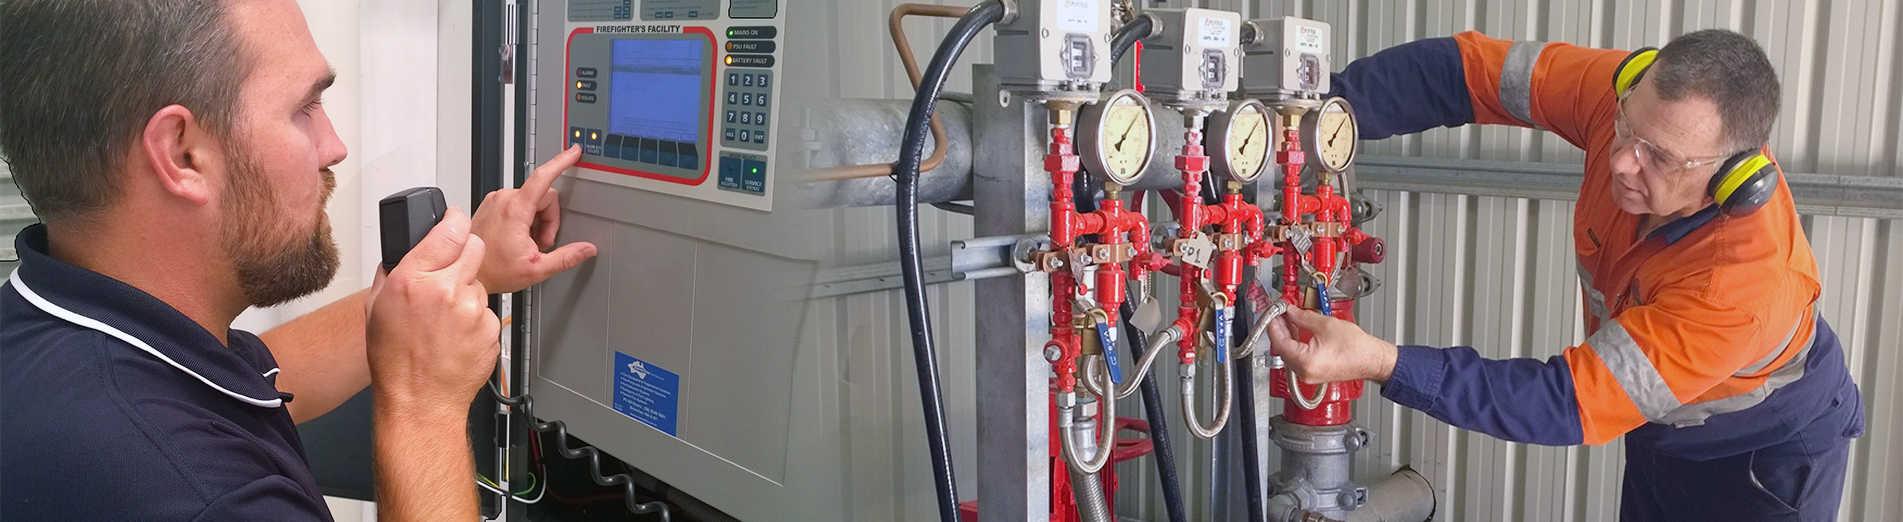 ProtectorFire_ElectricalPlumbingBanner_1903x522_mini